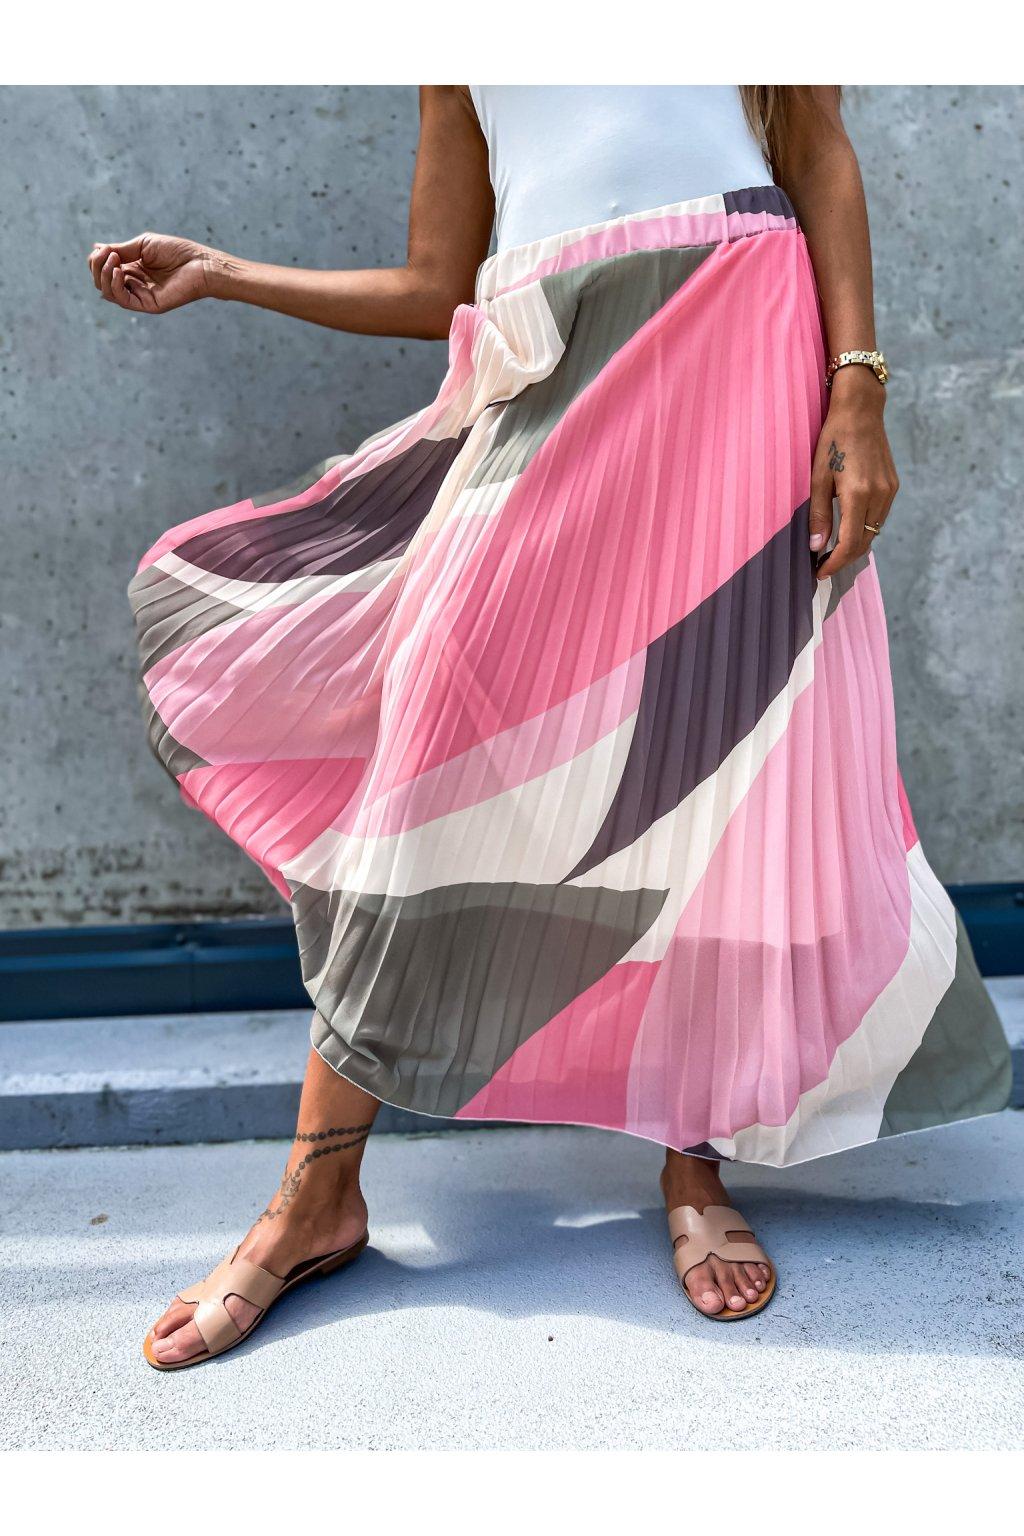 damska sukne monoir pink eshopat cz 4